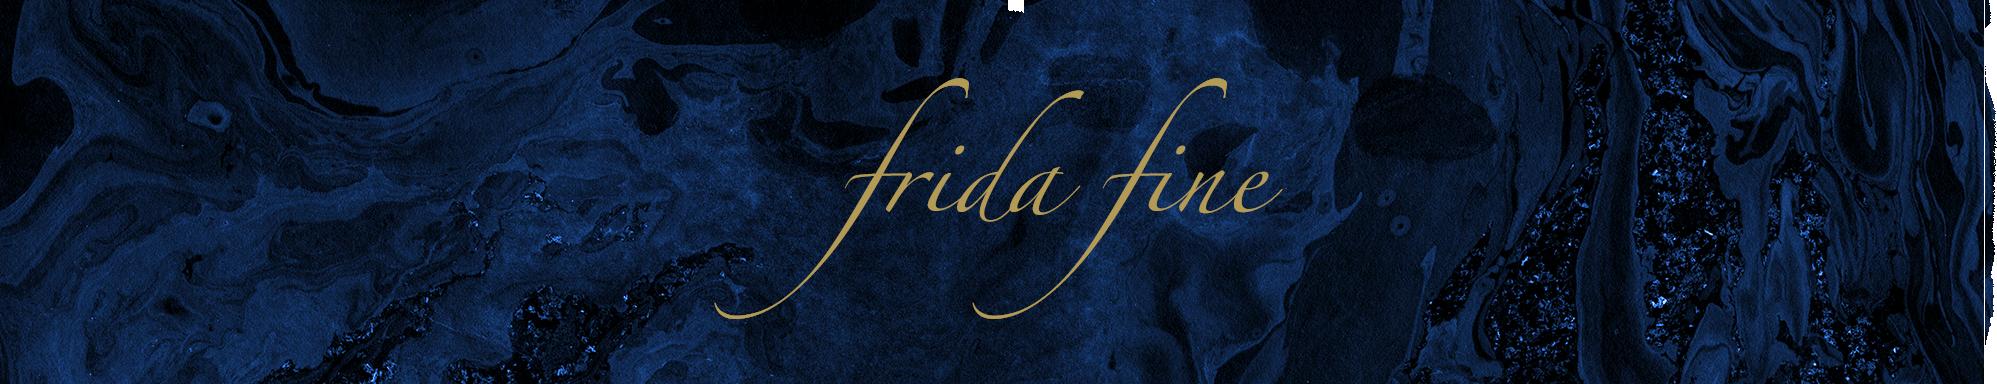 FRIDA Fine. Banner.